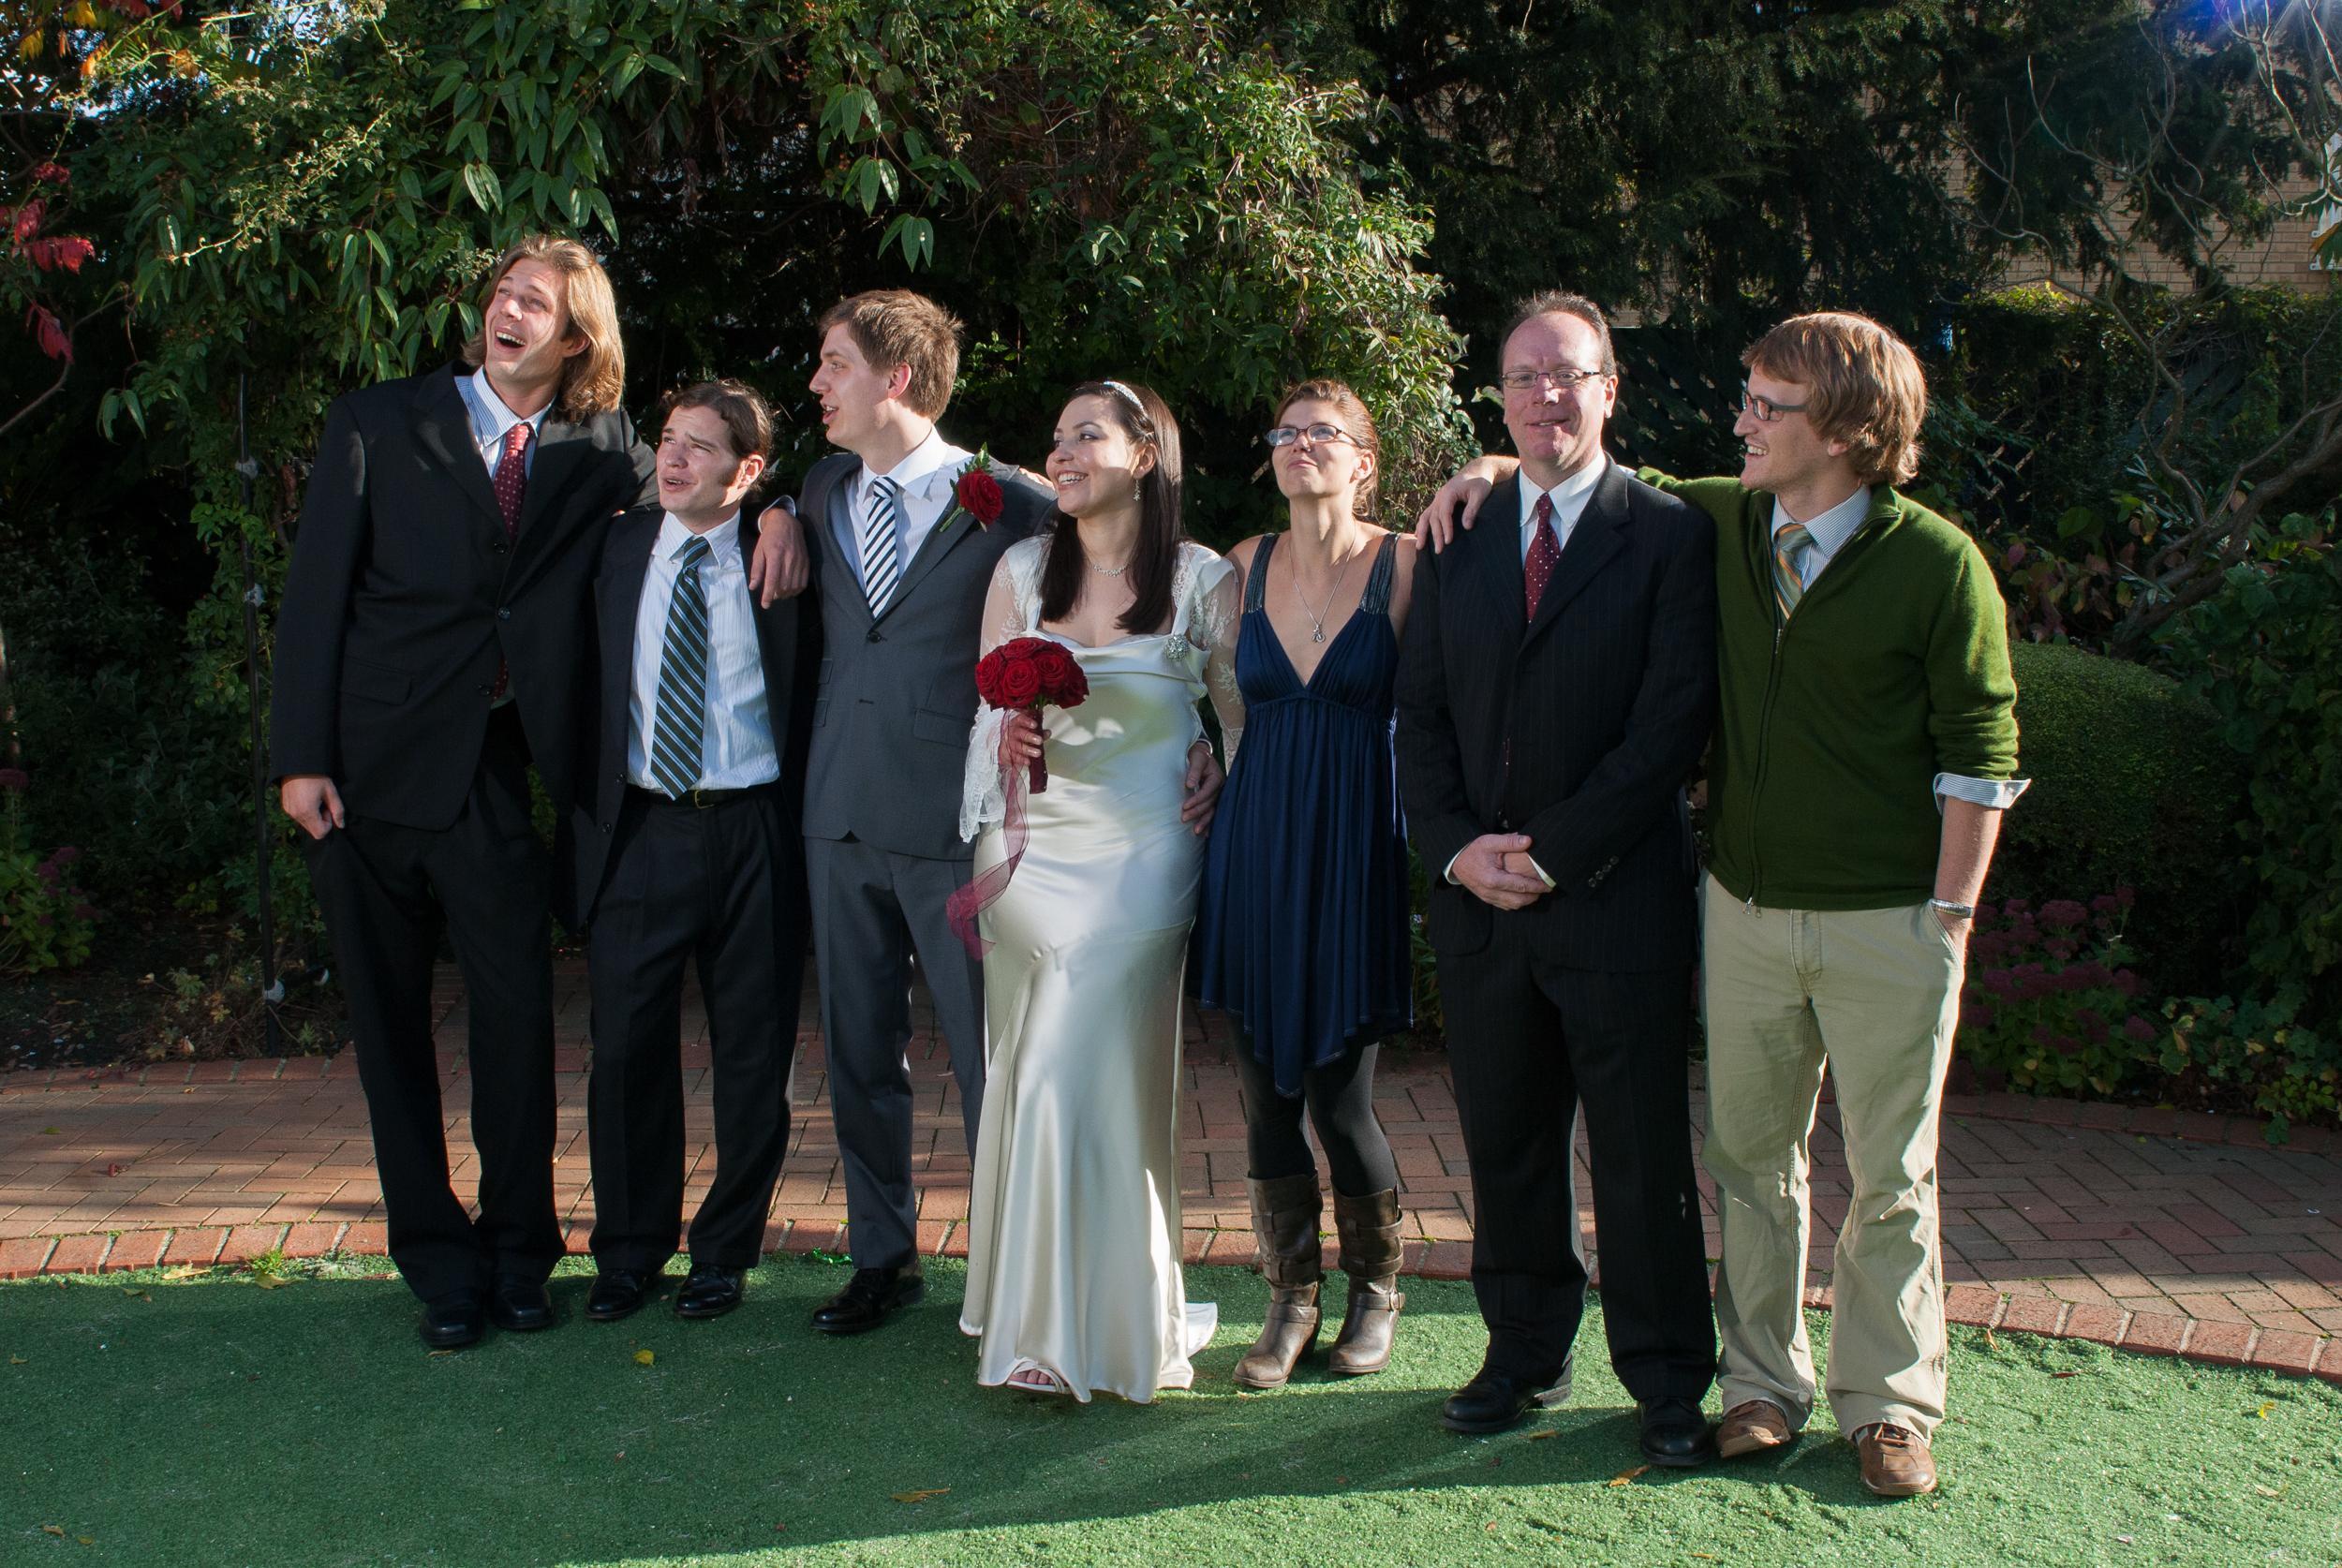 GEORGINA-COOK-WEDDING-PHOTOGRAPHY-GROUP.jpg